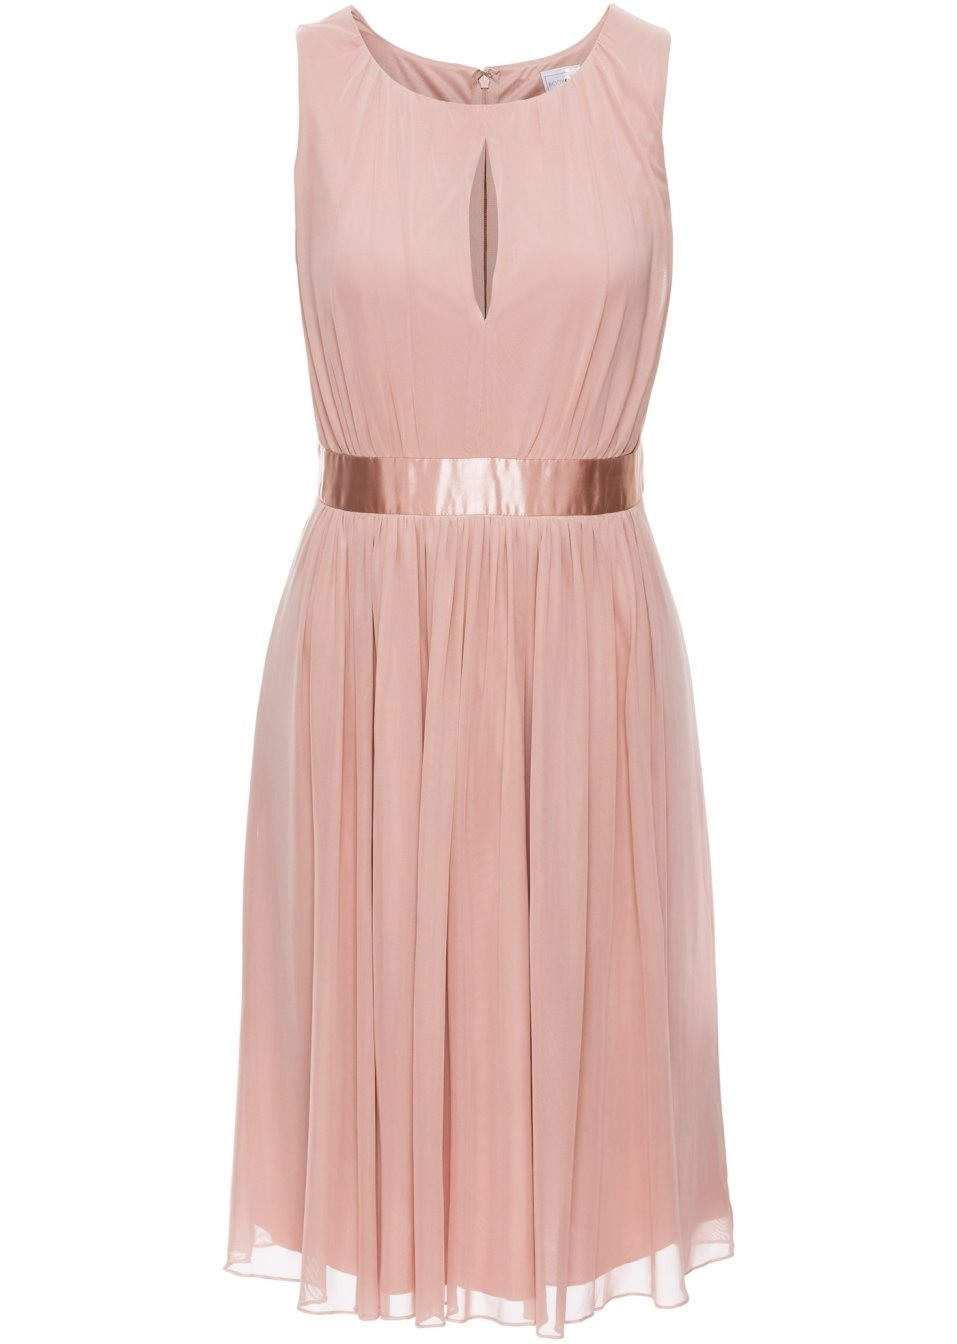 20 Cool Kleid Kurz Rosa für 2019Formal Perfekt Kleid Kurz Rosa Bester Preis